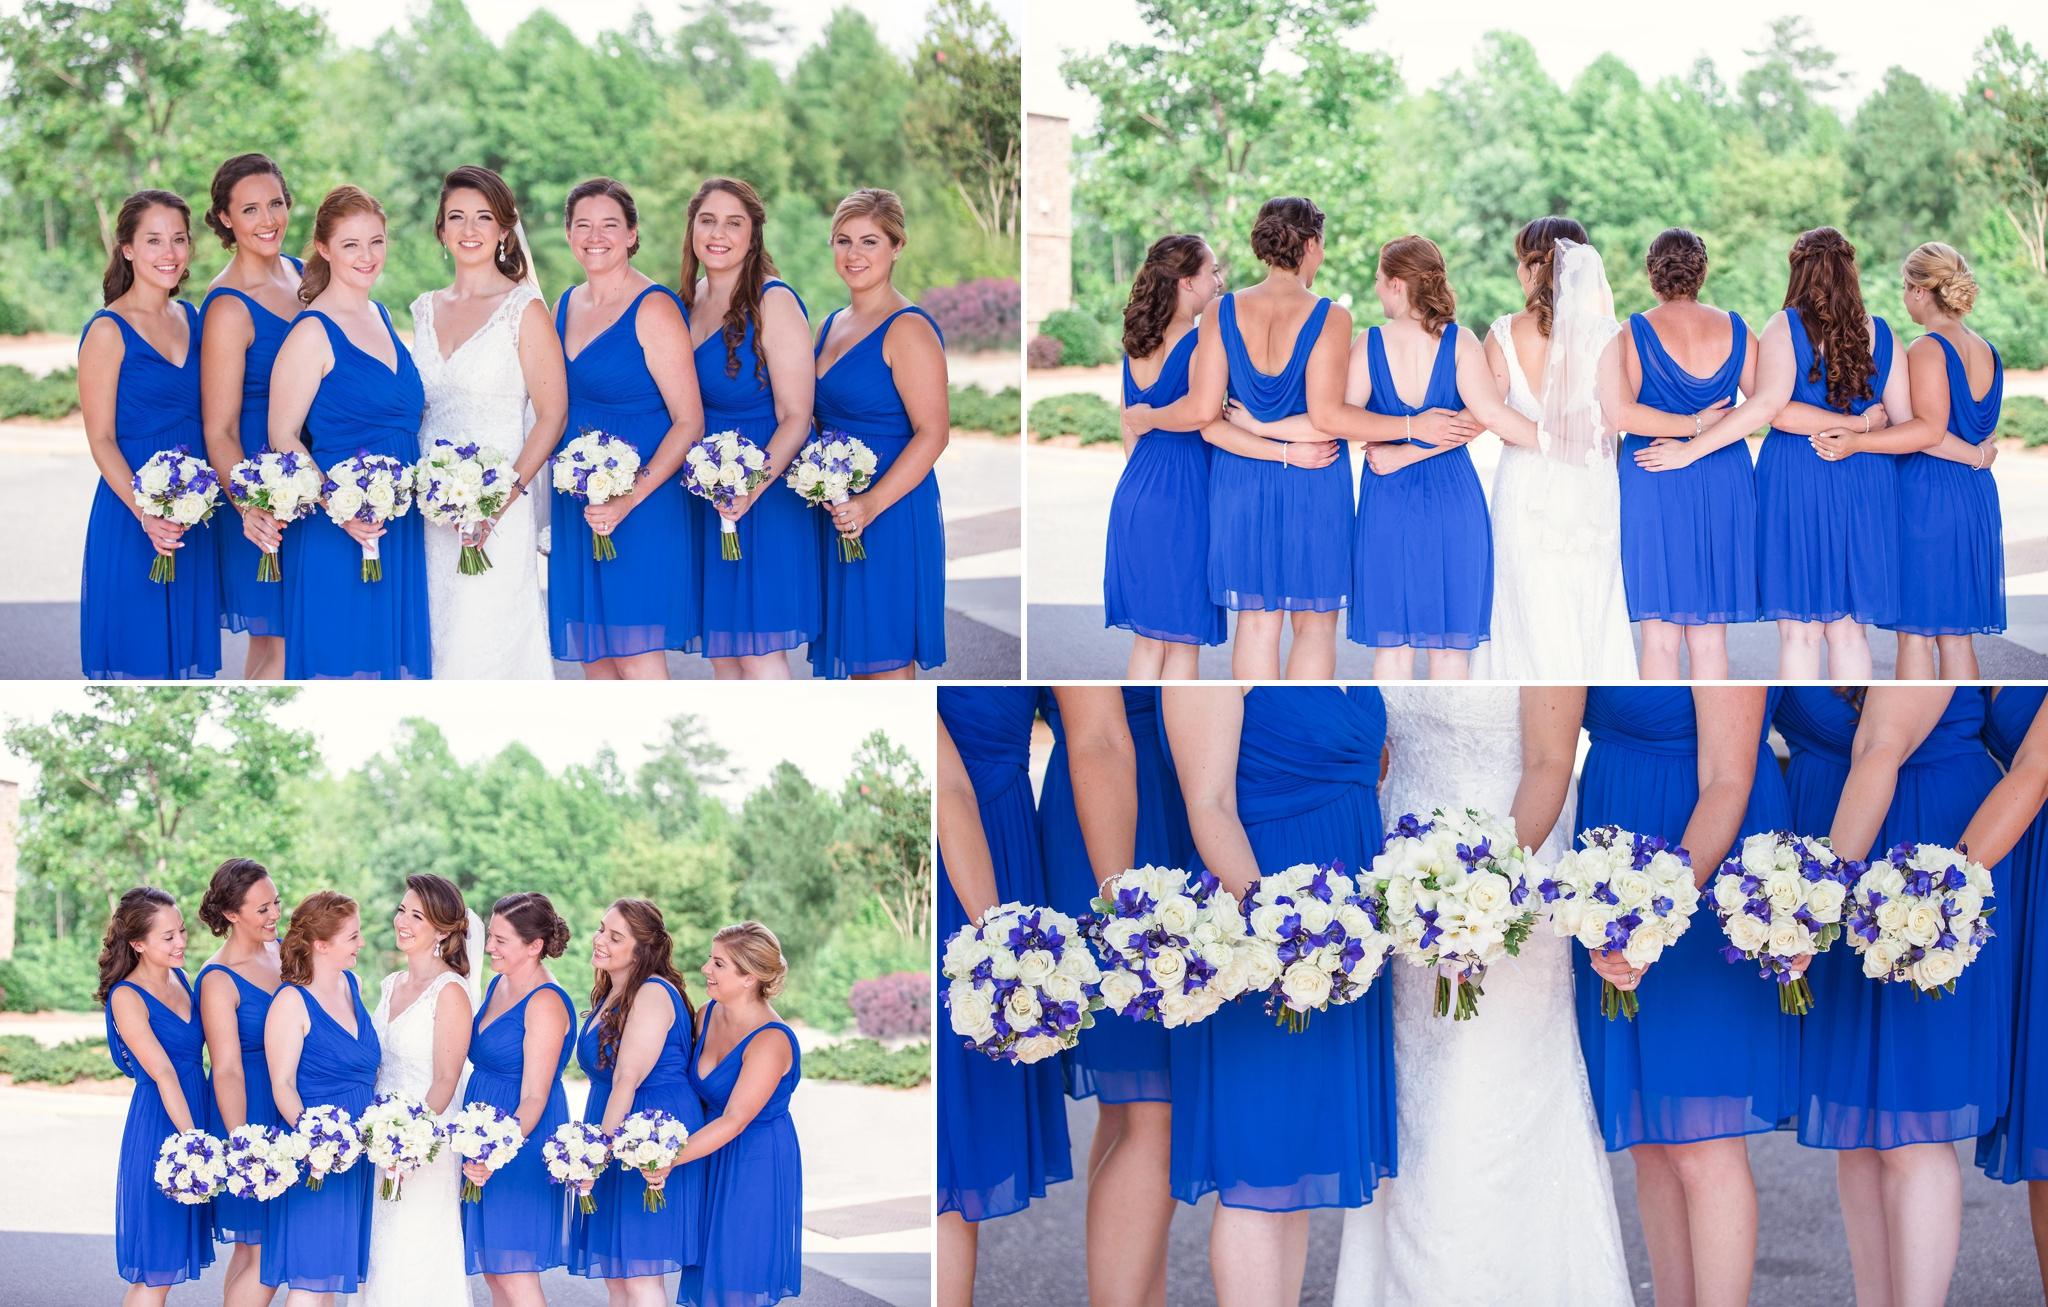 Wedding Photography in Cary, North Carolina